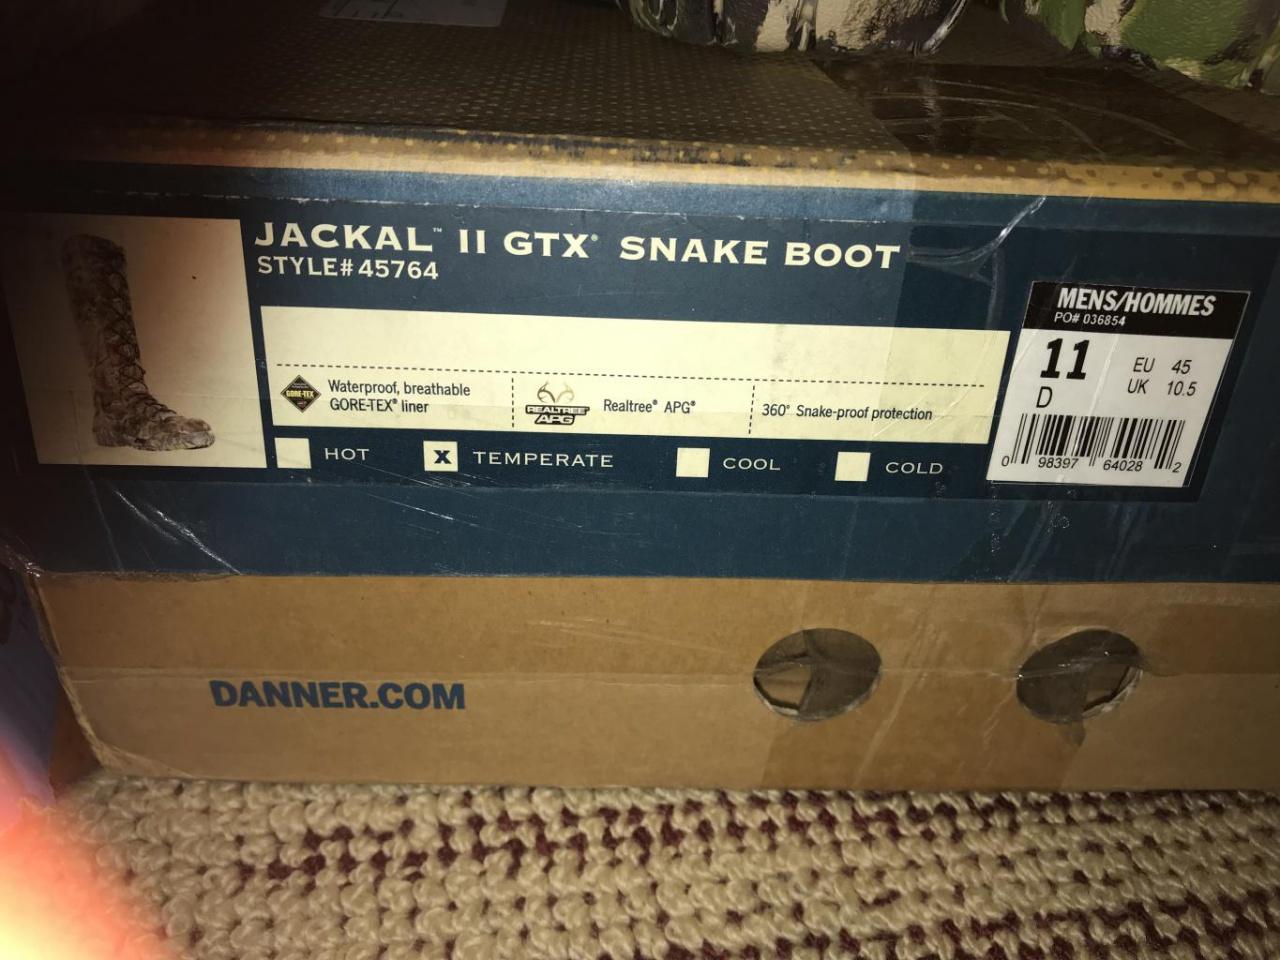 Danner Jackal II GTX Snake Boots - Pace or Downtown-9c13cd59-b2cf-4c66-be1d-62a04a8b68f2_1509245534123-jpg